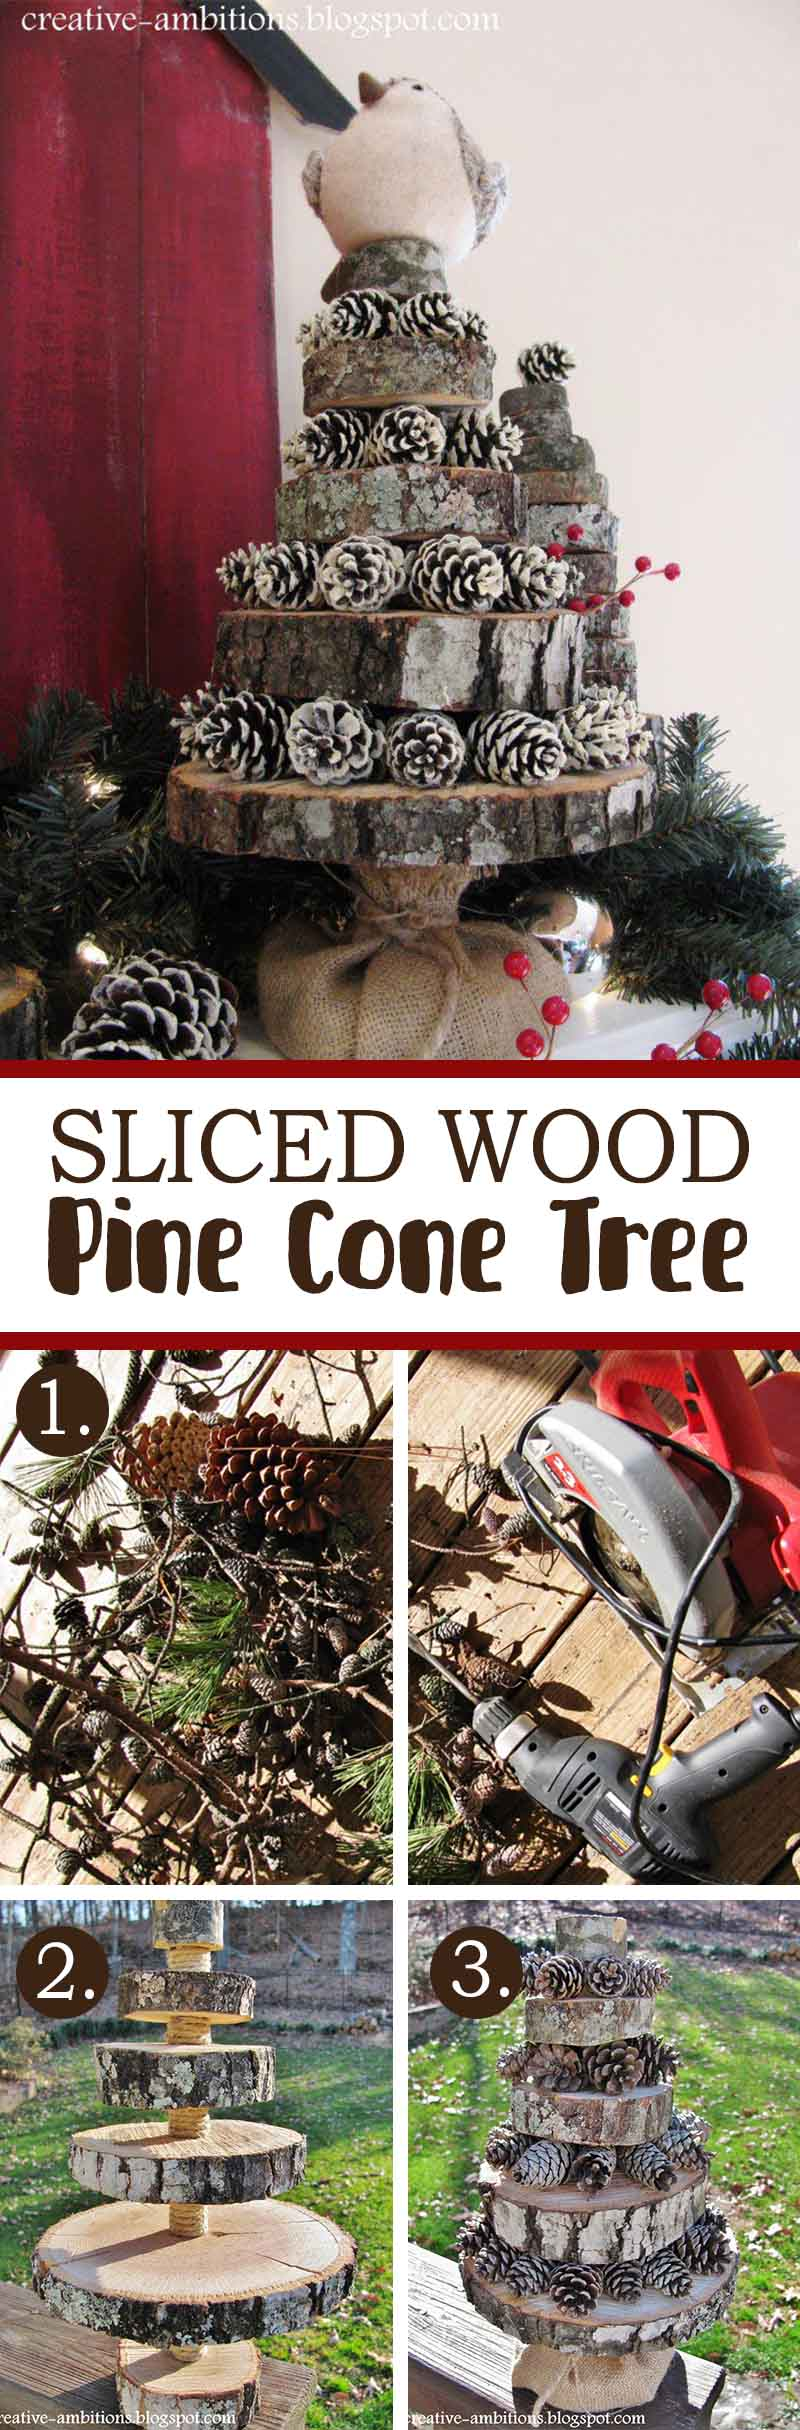 Sliced Wood Pine Cone Tree